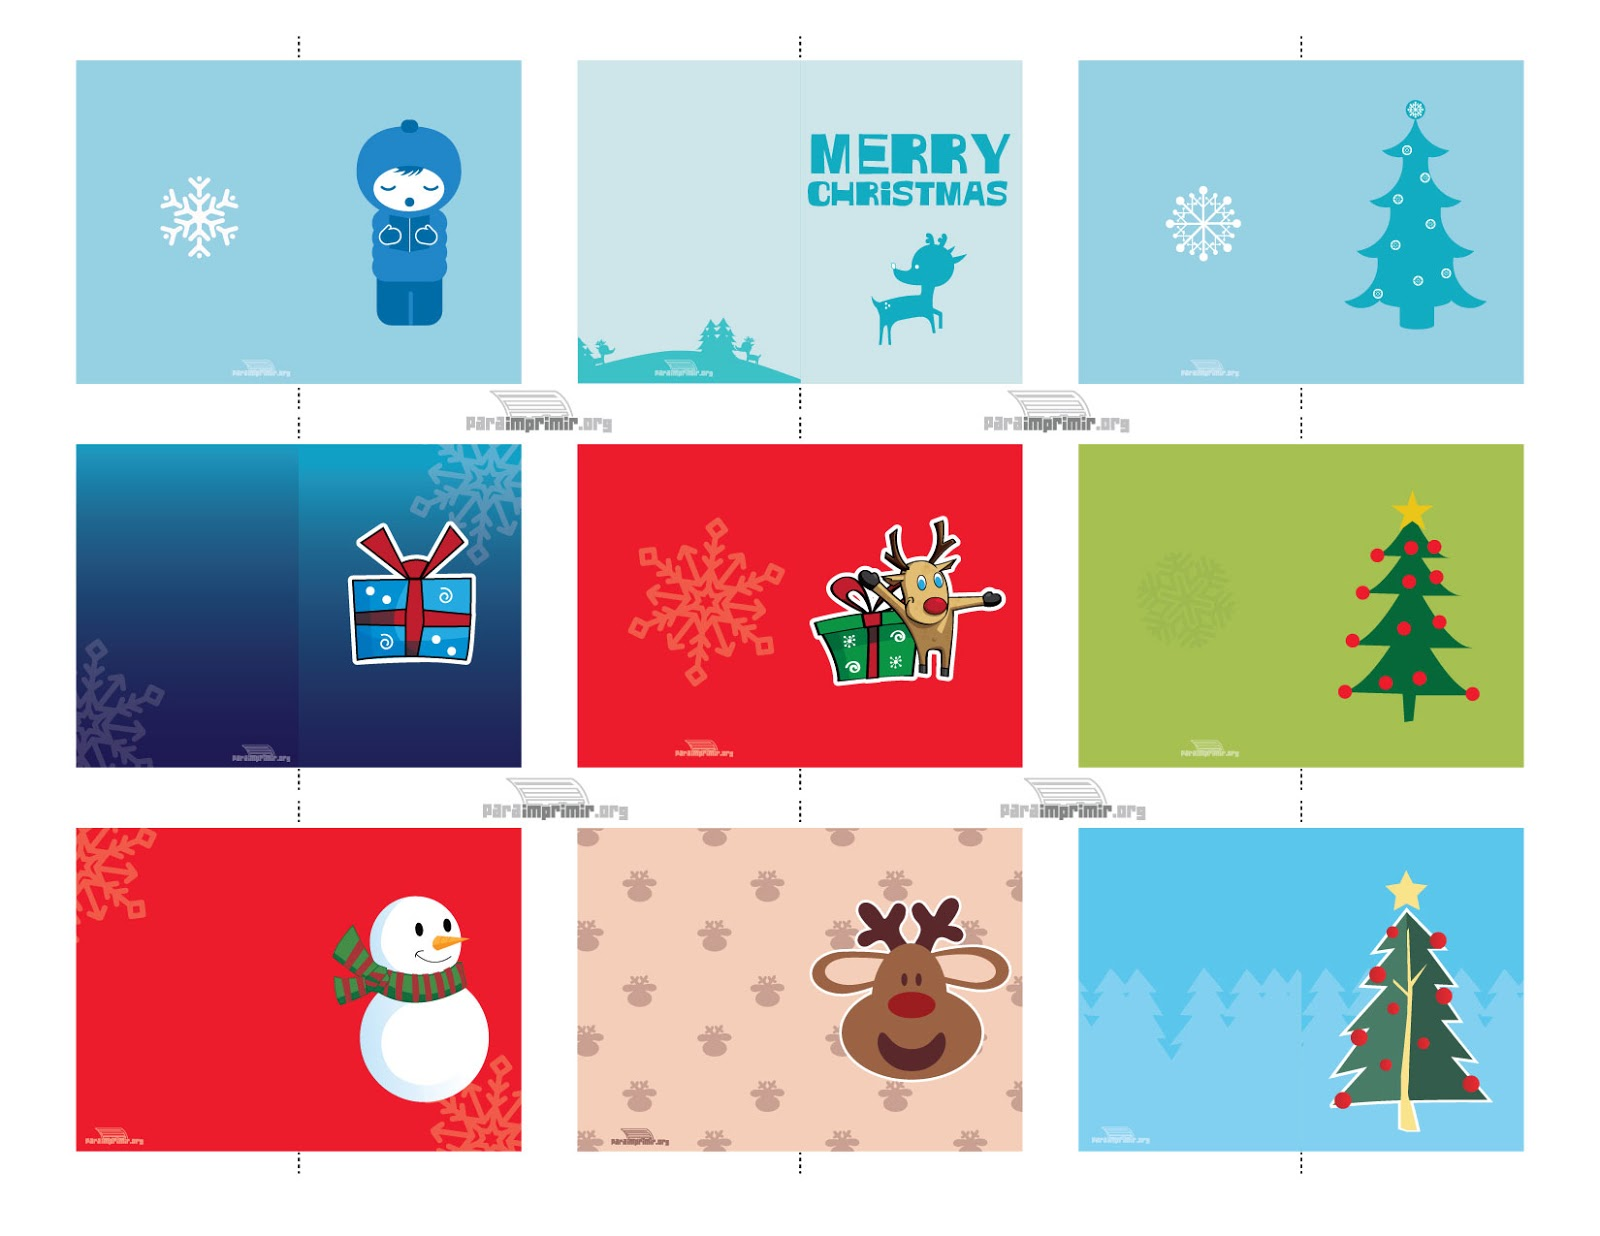 ♥Feliz Navidad-Merry Christmas♥: Tarjetitas